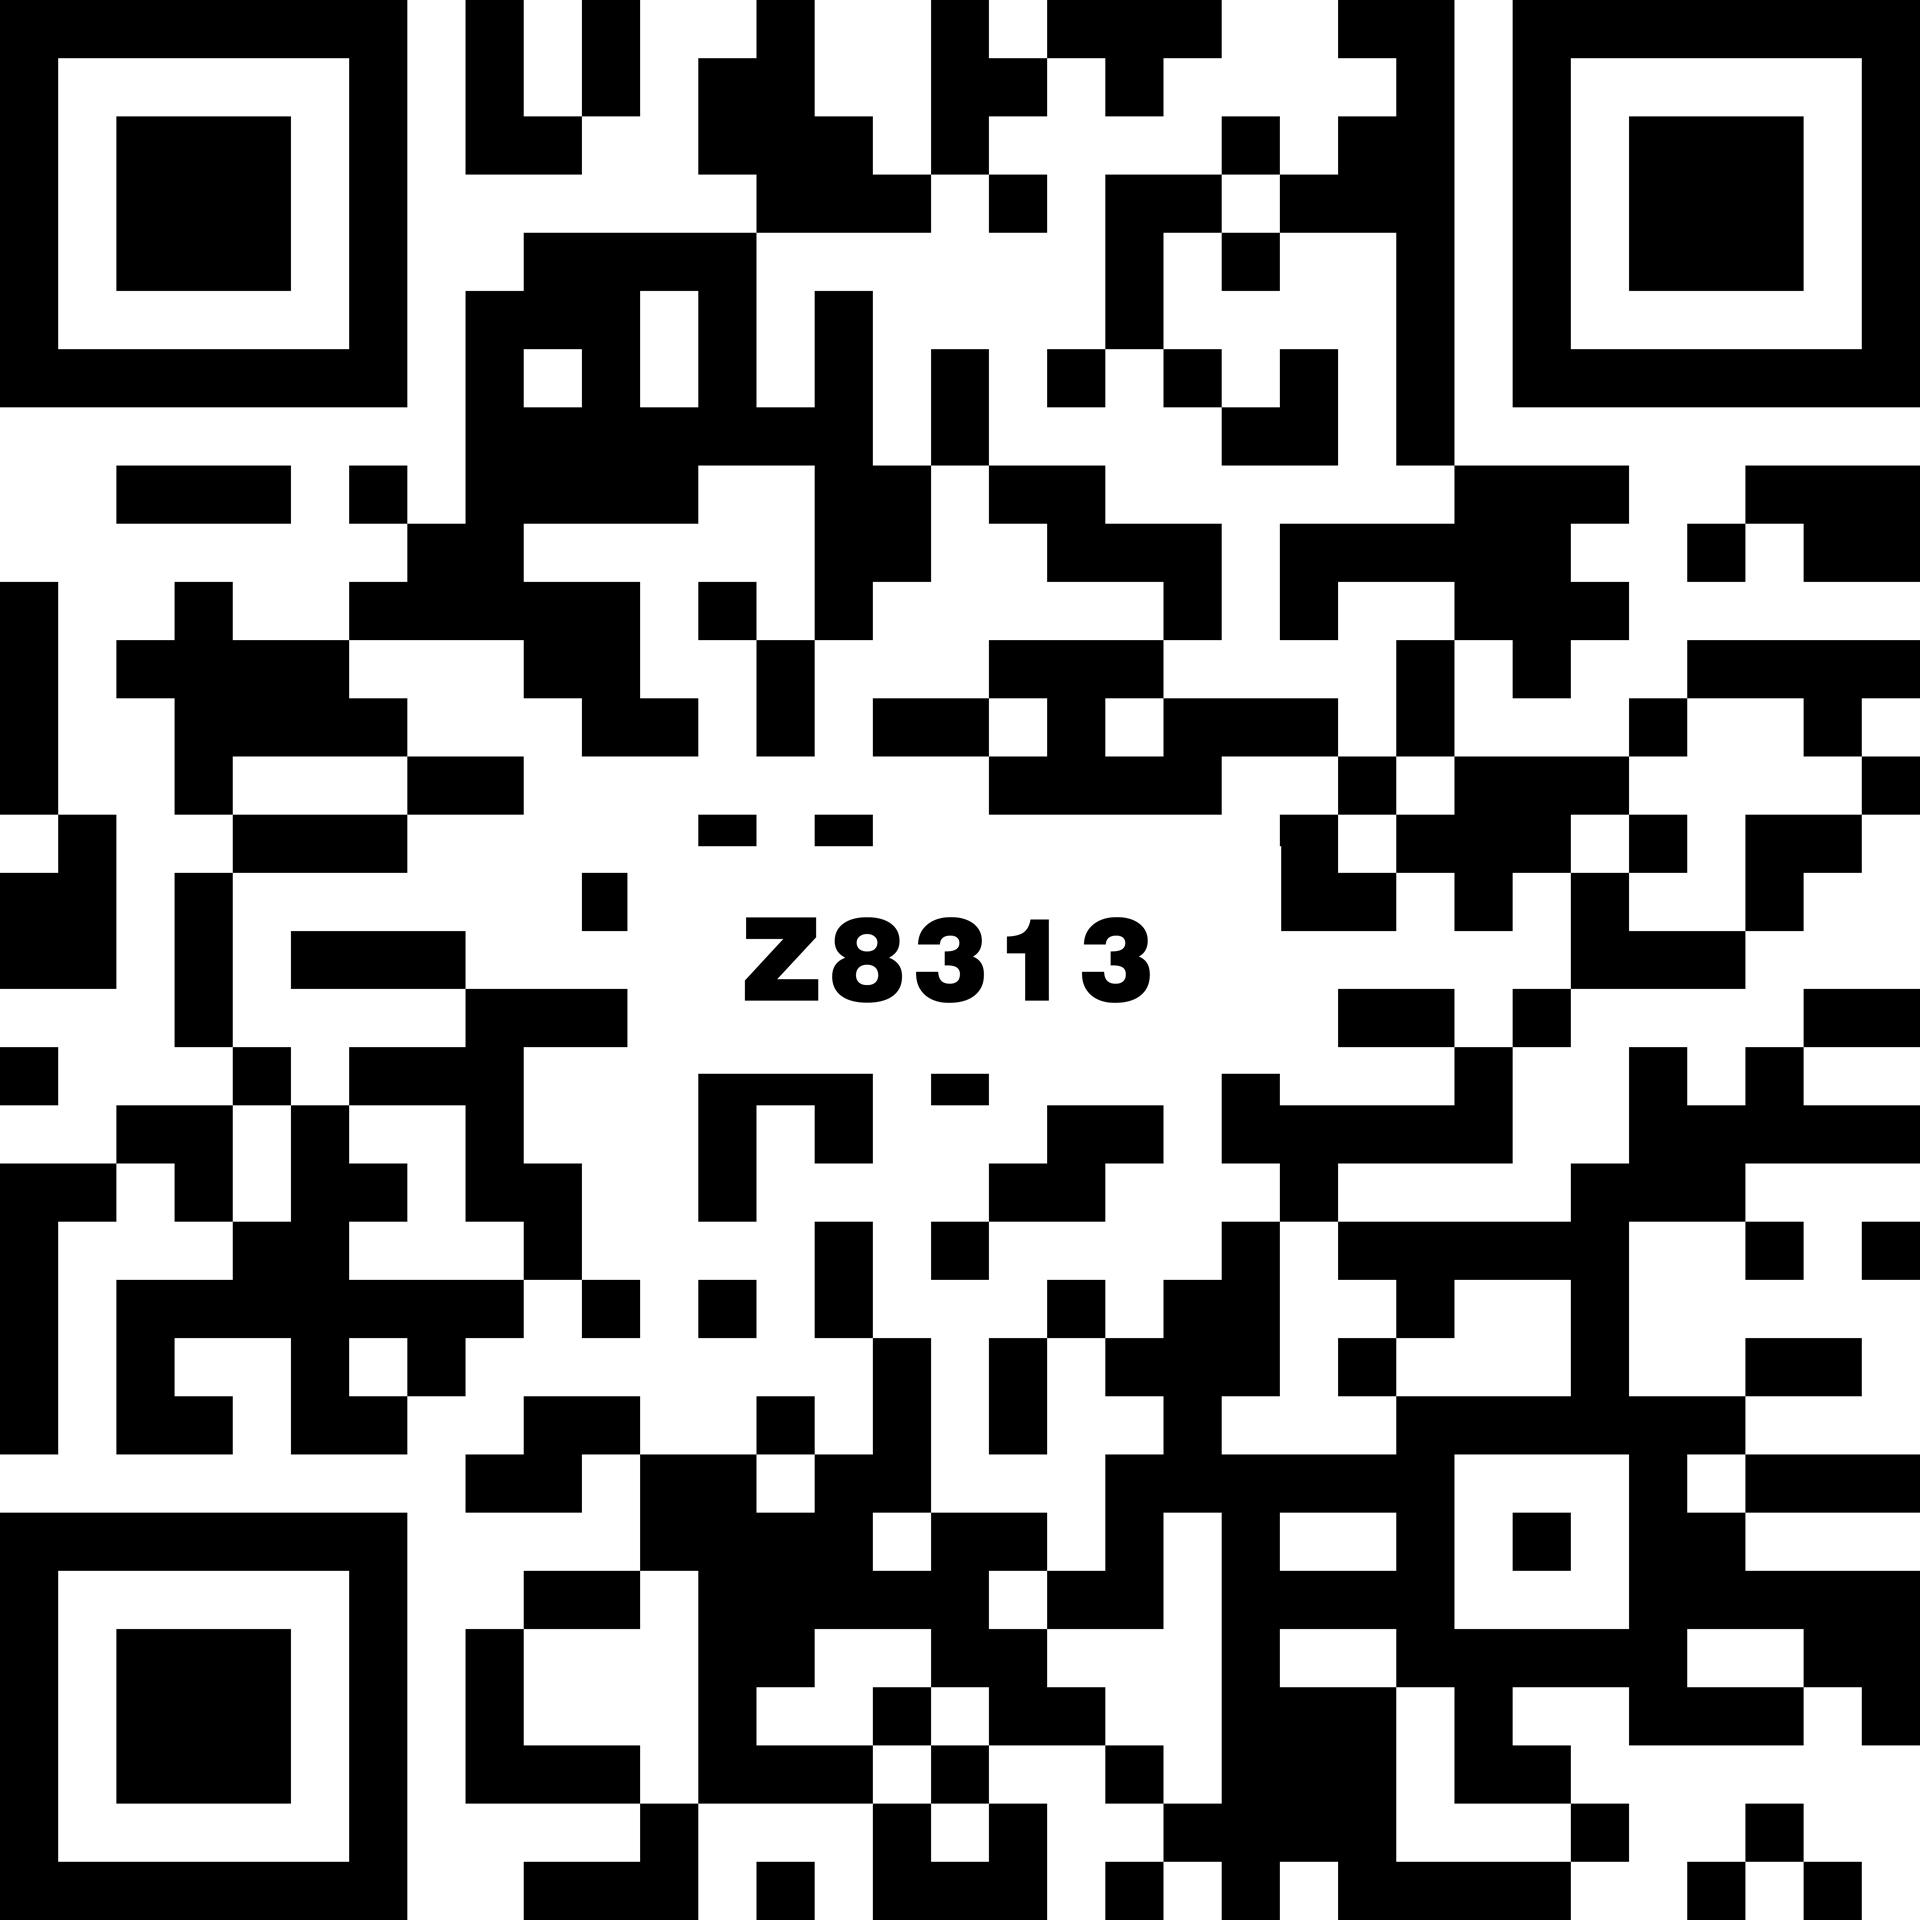 Z8313